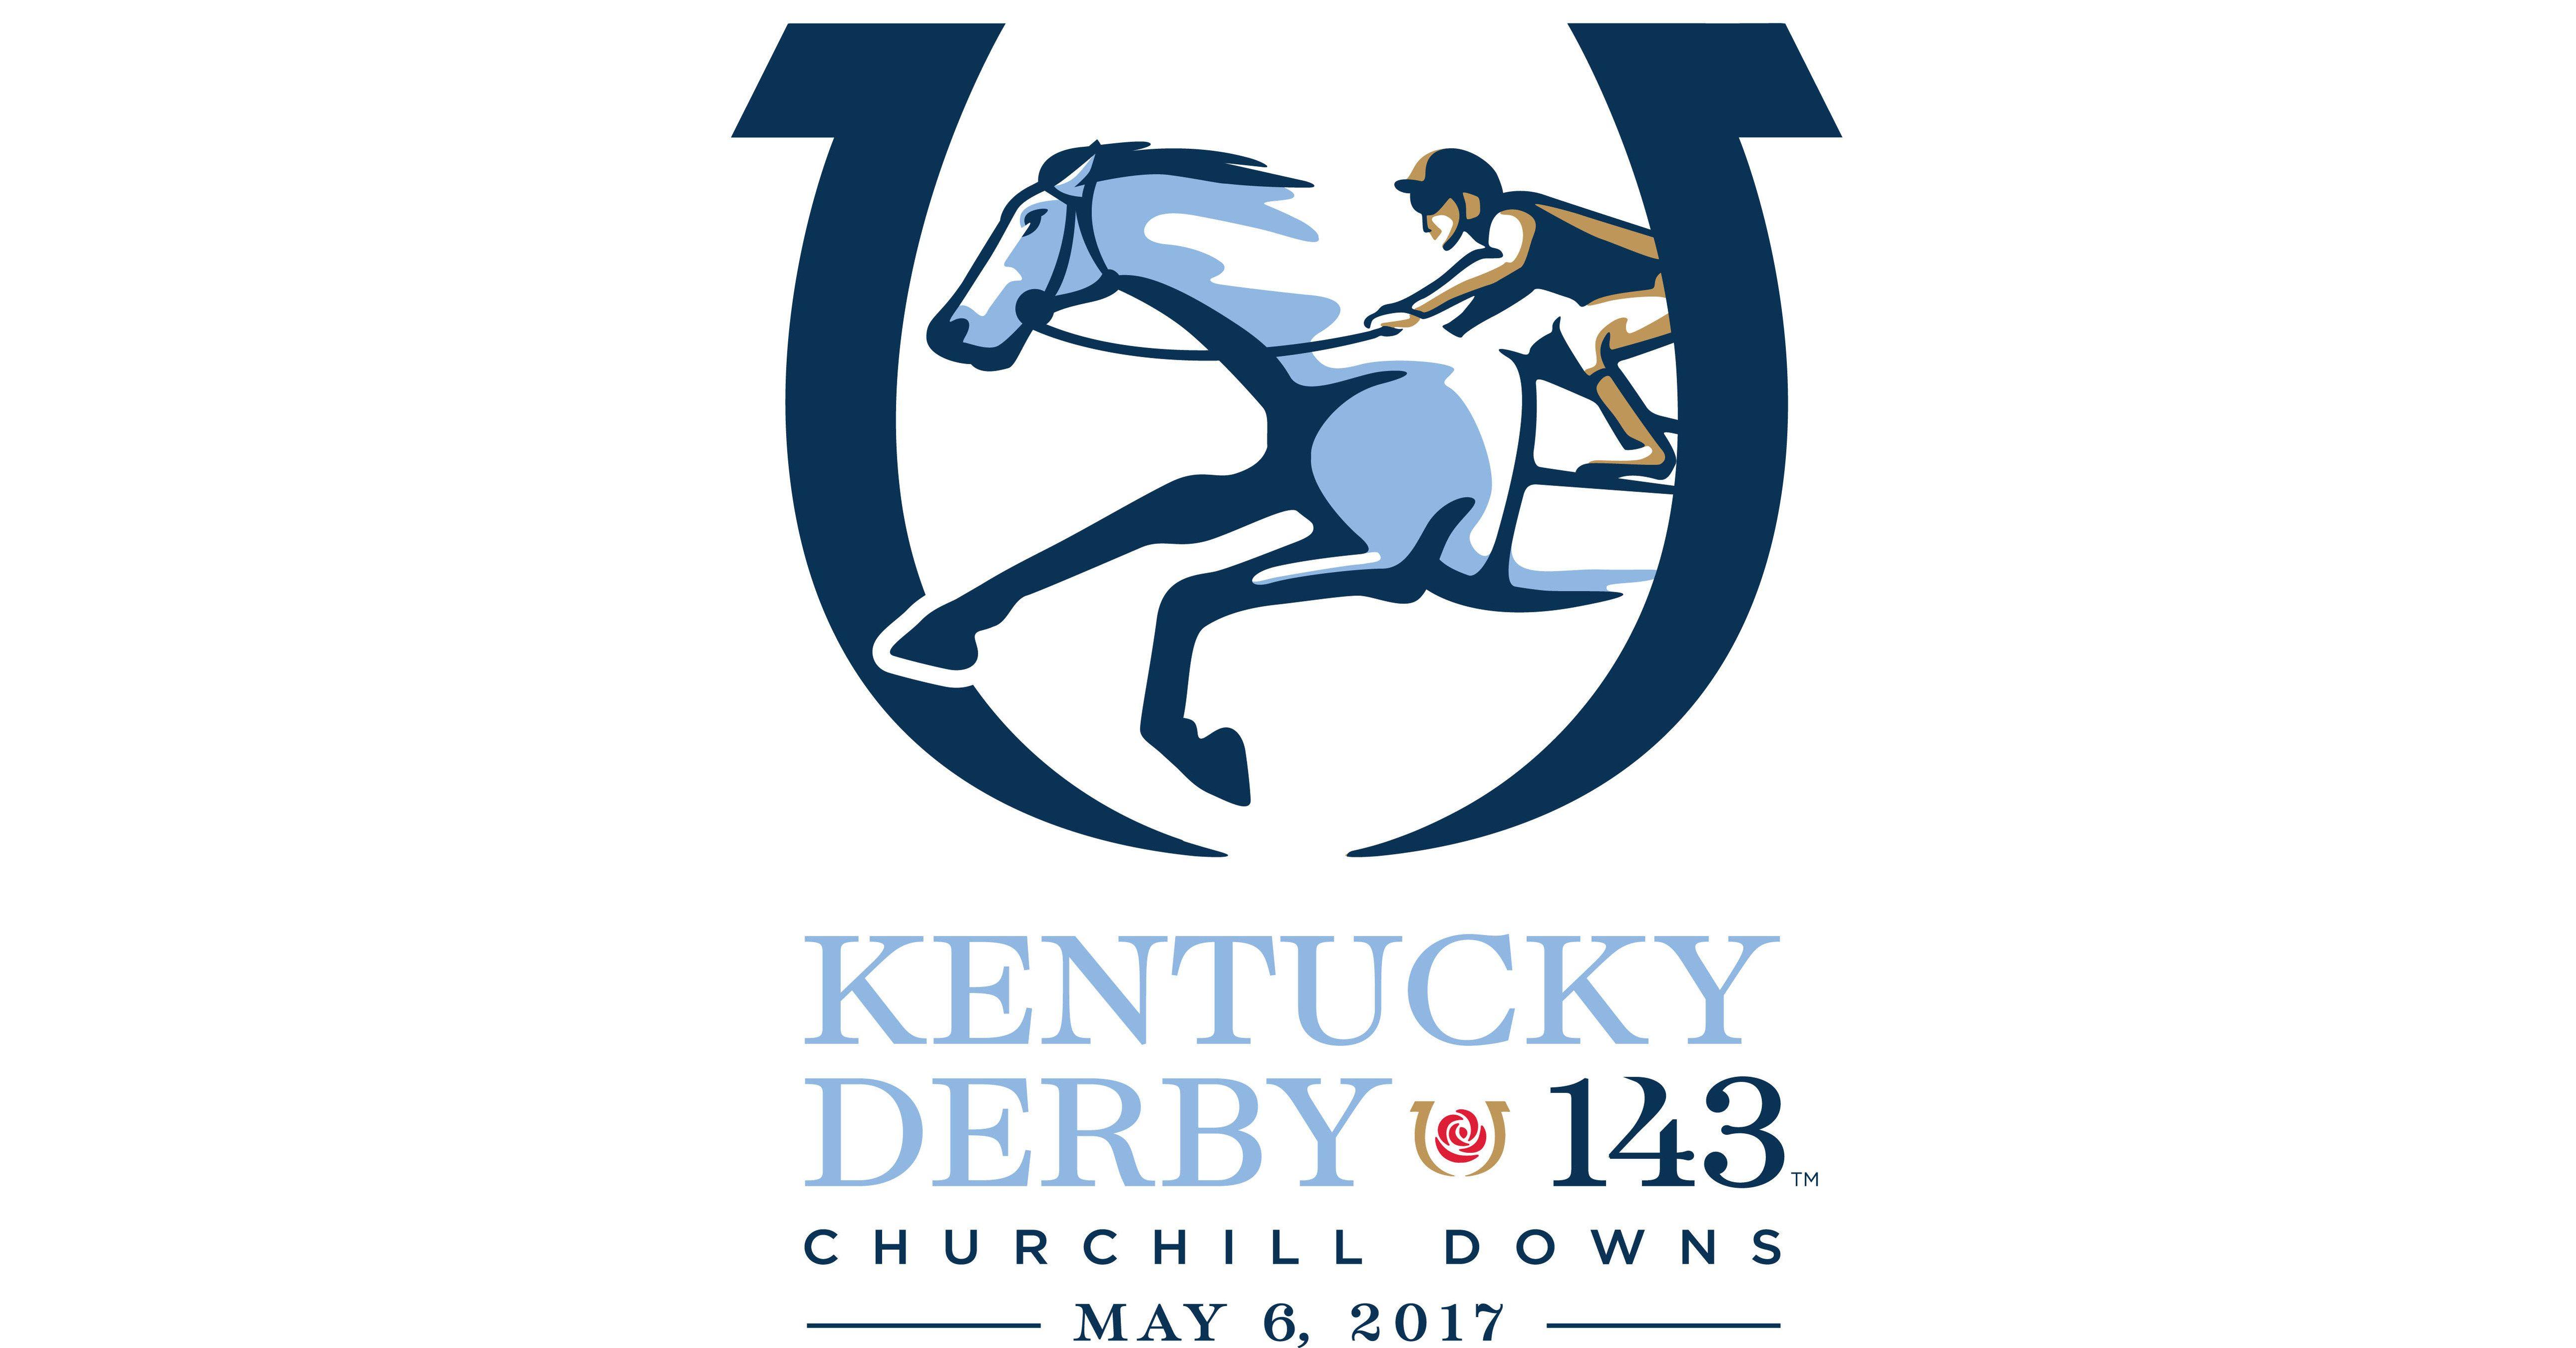 2021 kentucky derby betting menu betbright 20 risk free betting